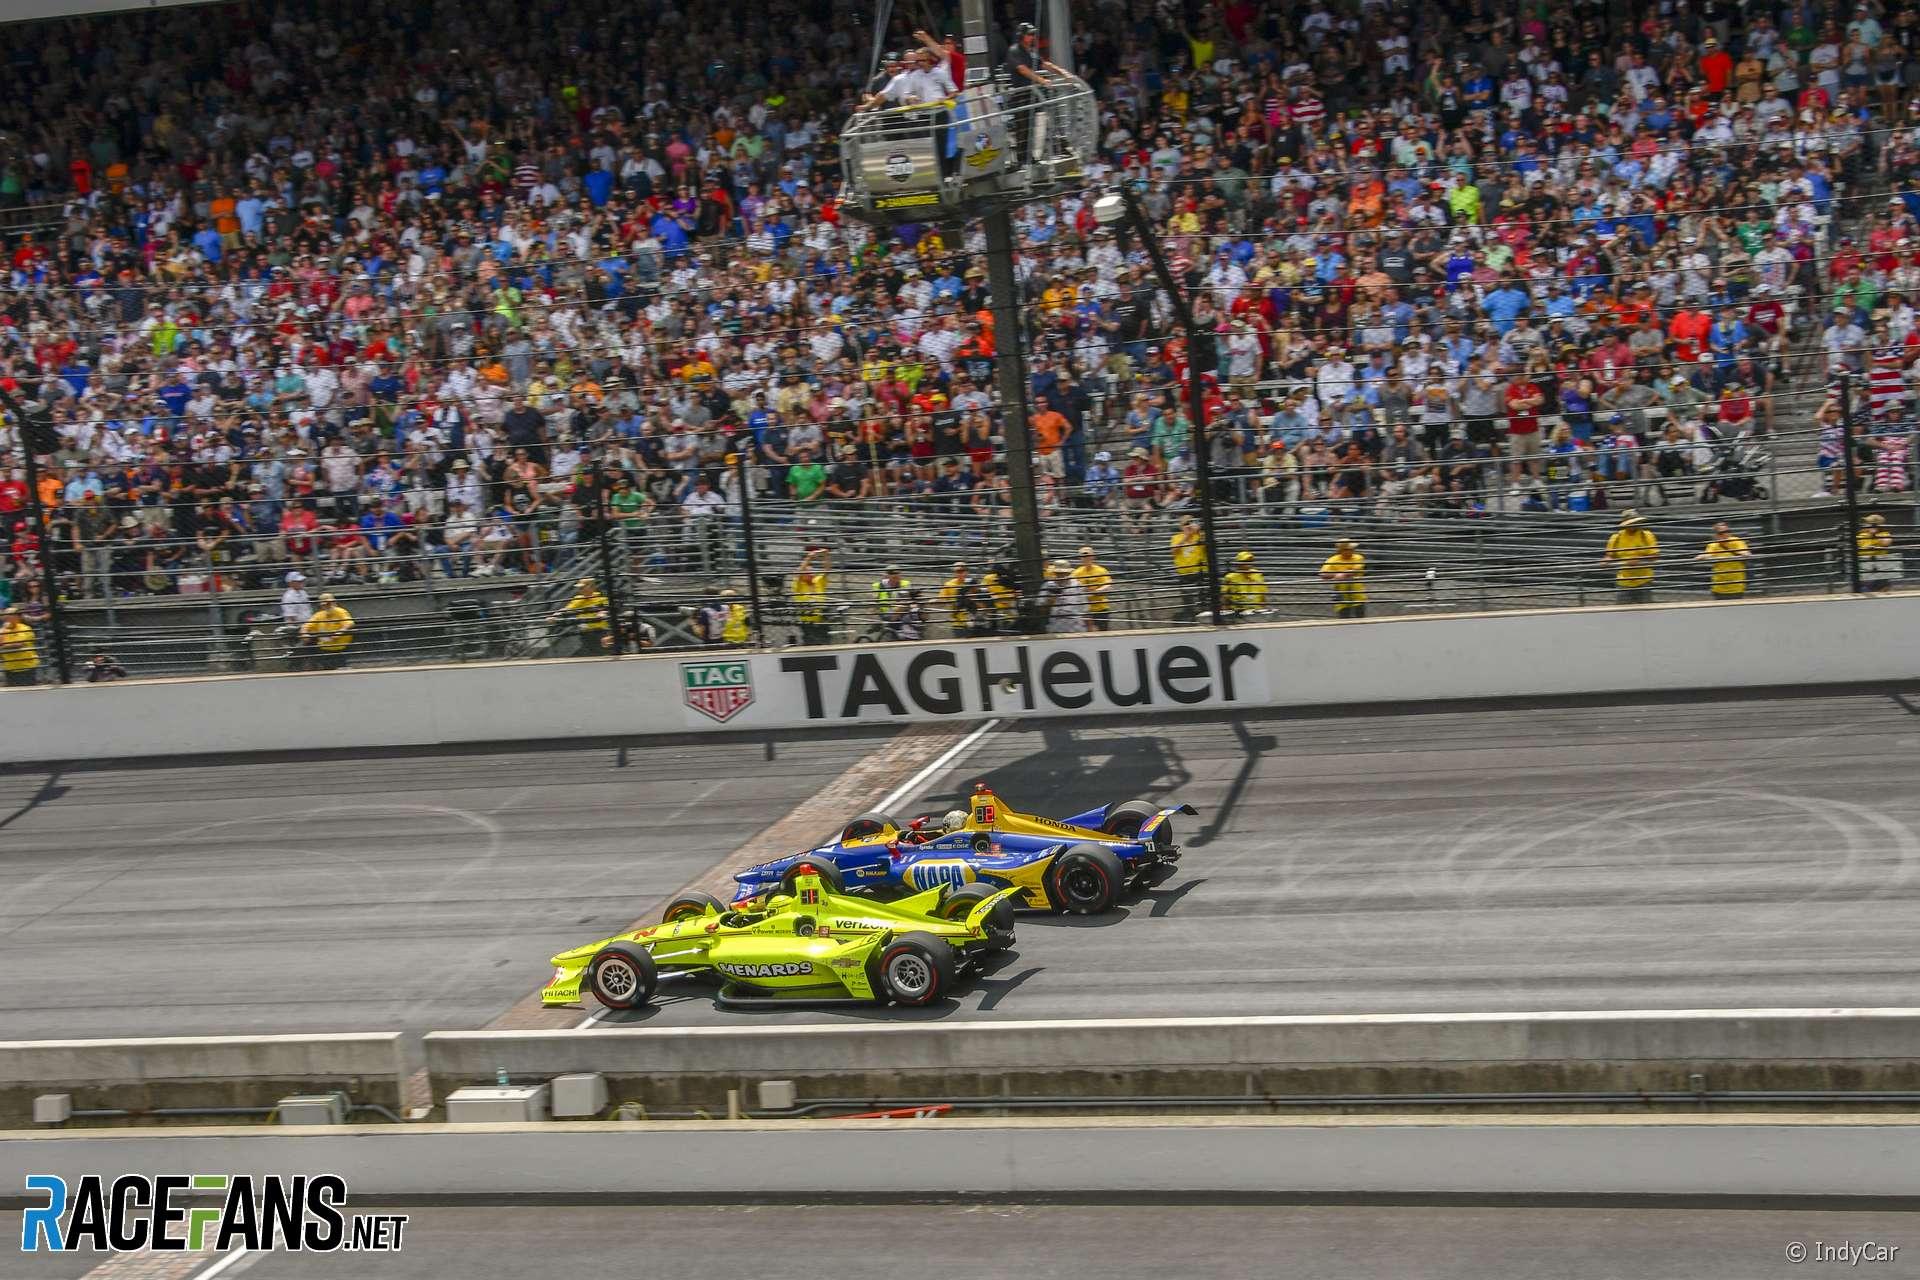 Simon Pagenaud, Alexander Rossi, IndyCar, Indianapolis 500, 2019